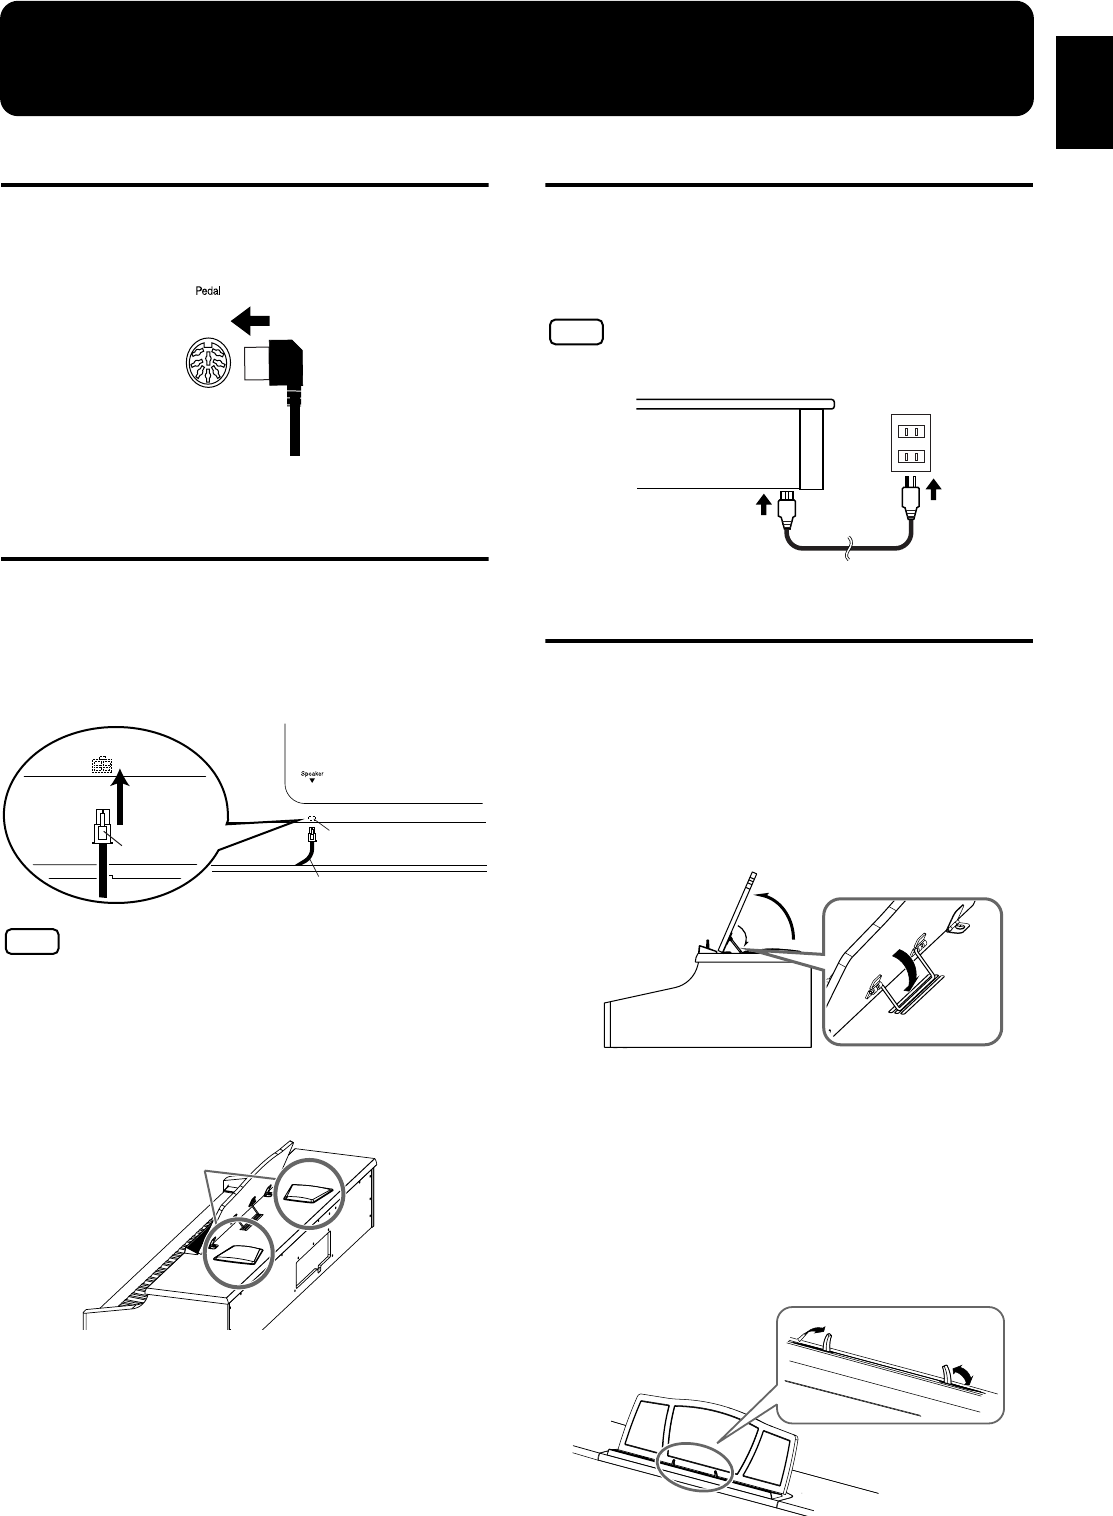 Roland Kr107 Users Manual E Back Gt Gallery For Foxtrot Dance Steps Diagram 17